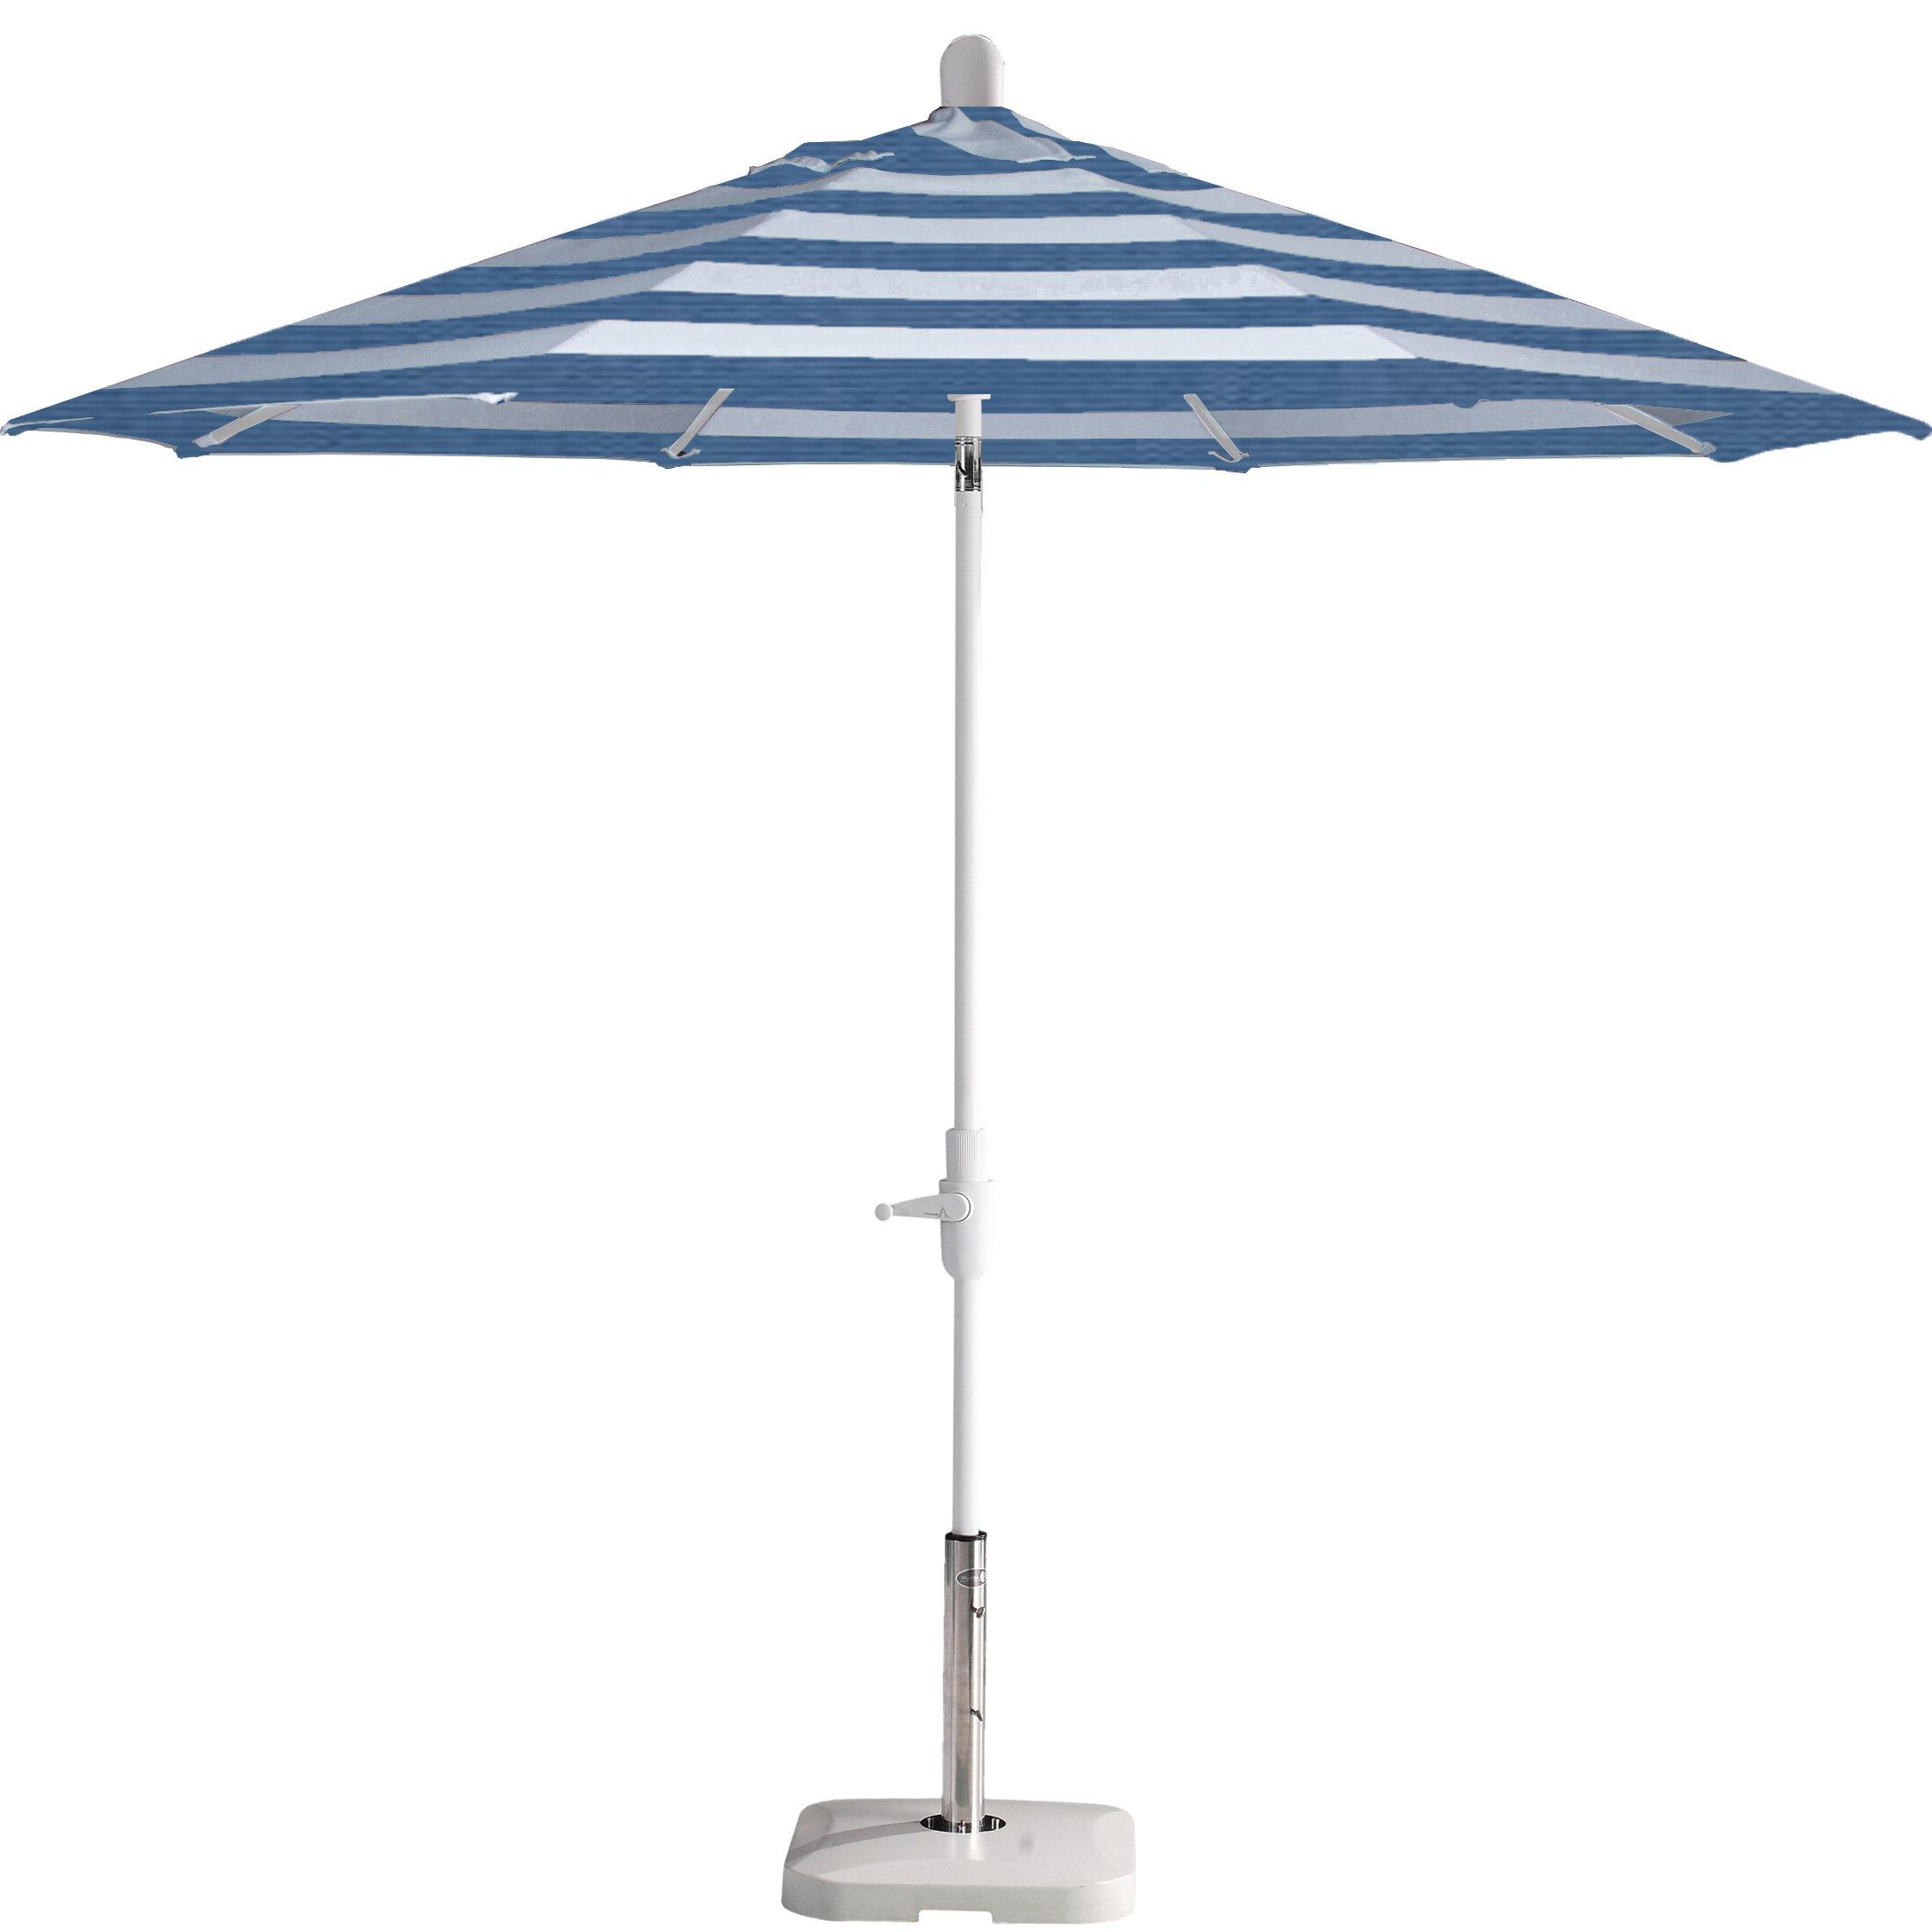 Wiebe Auto Tilt 9' Market Sunbrella Umbrella In Most Current Wieczorek Auto Tilt Rectangular Market Sunbrella Umbrellas (View 7 of 20)